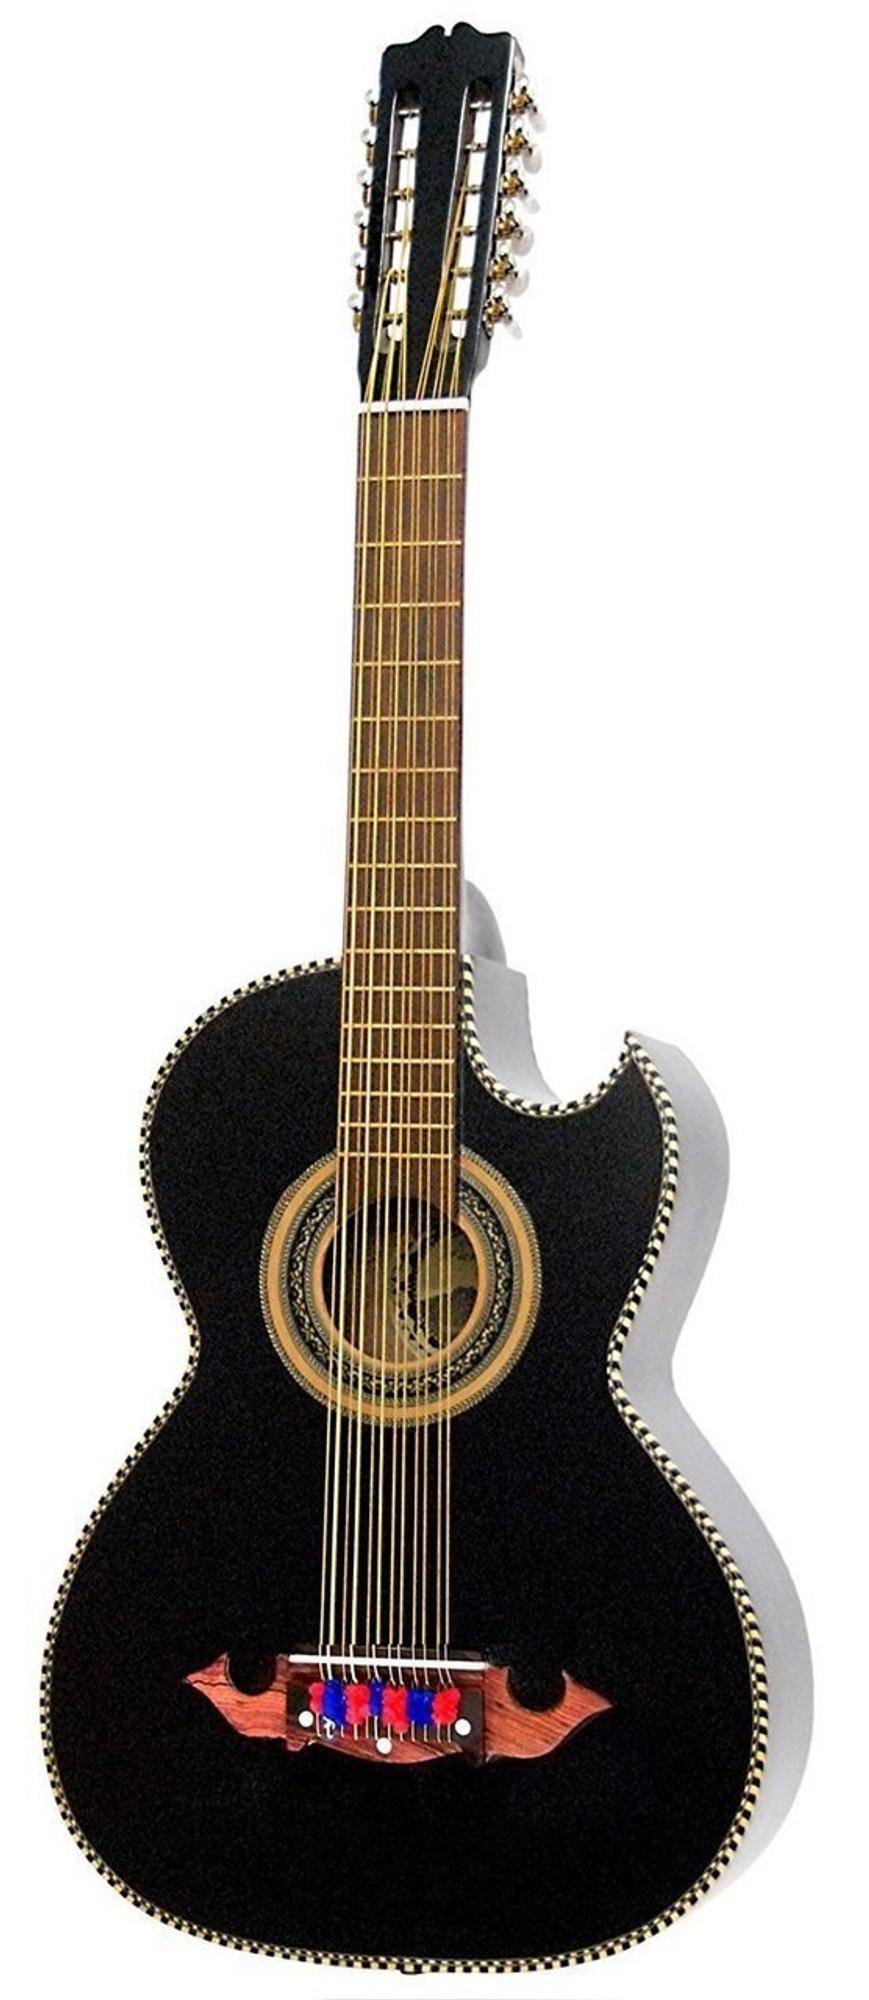 alpha-grp.co.jp PARACHO BAJO SEXTO BLACK Musical Instruments Steel ...